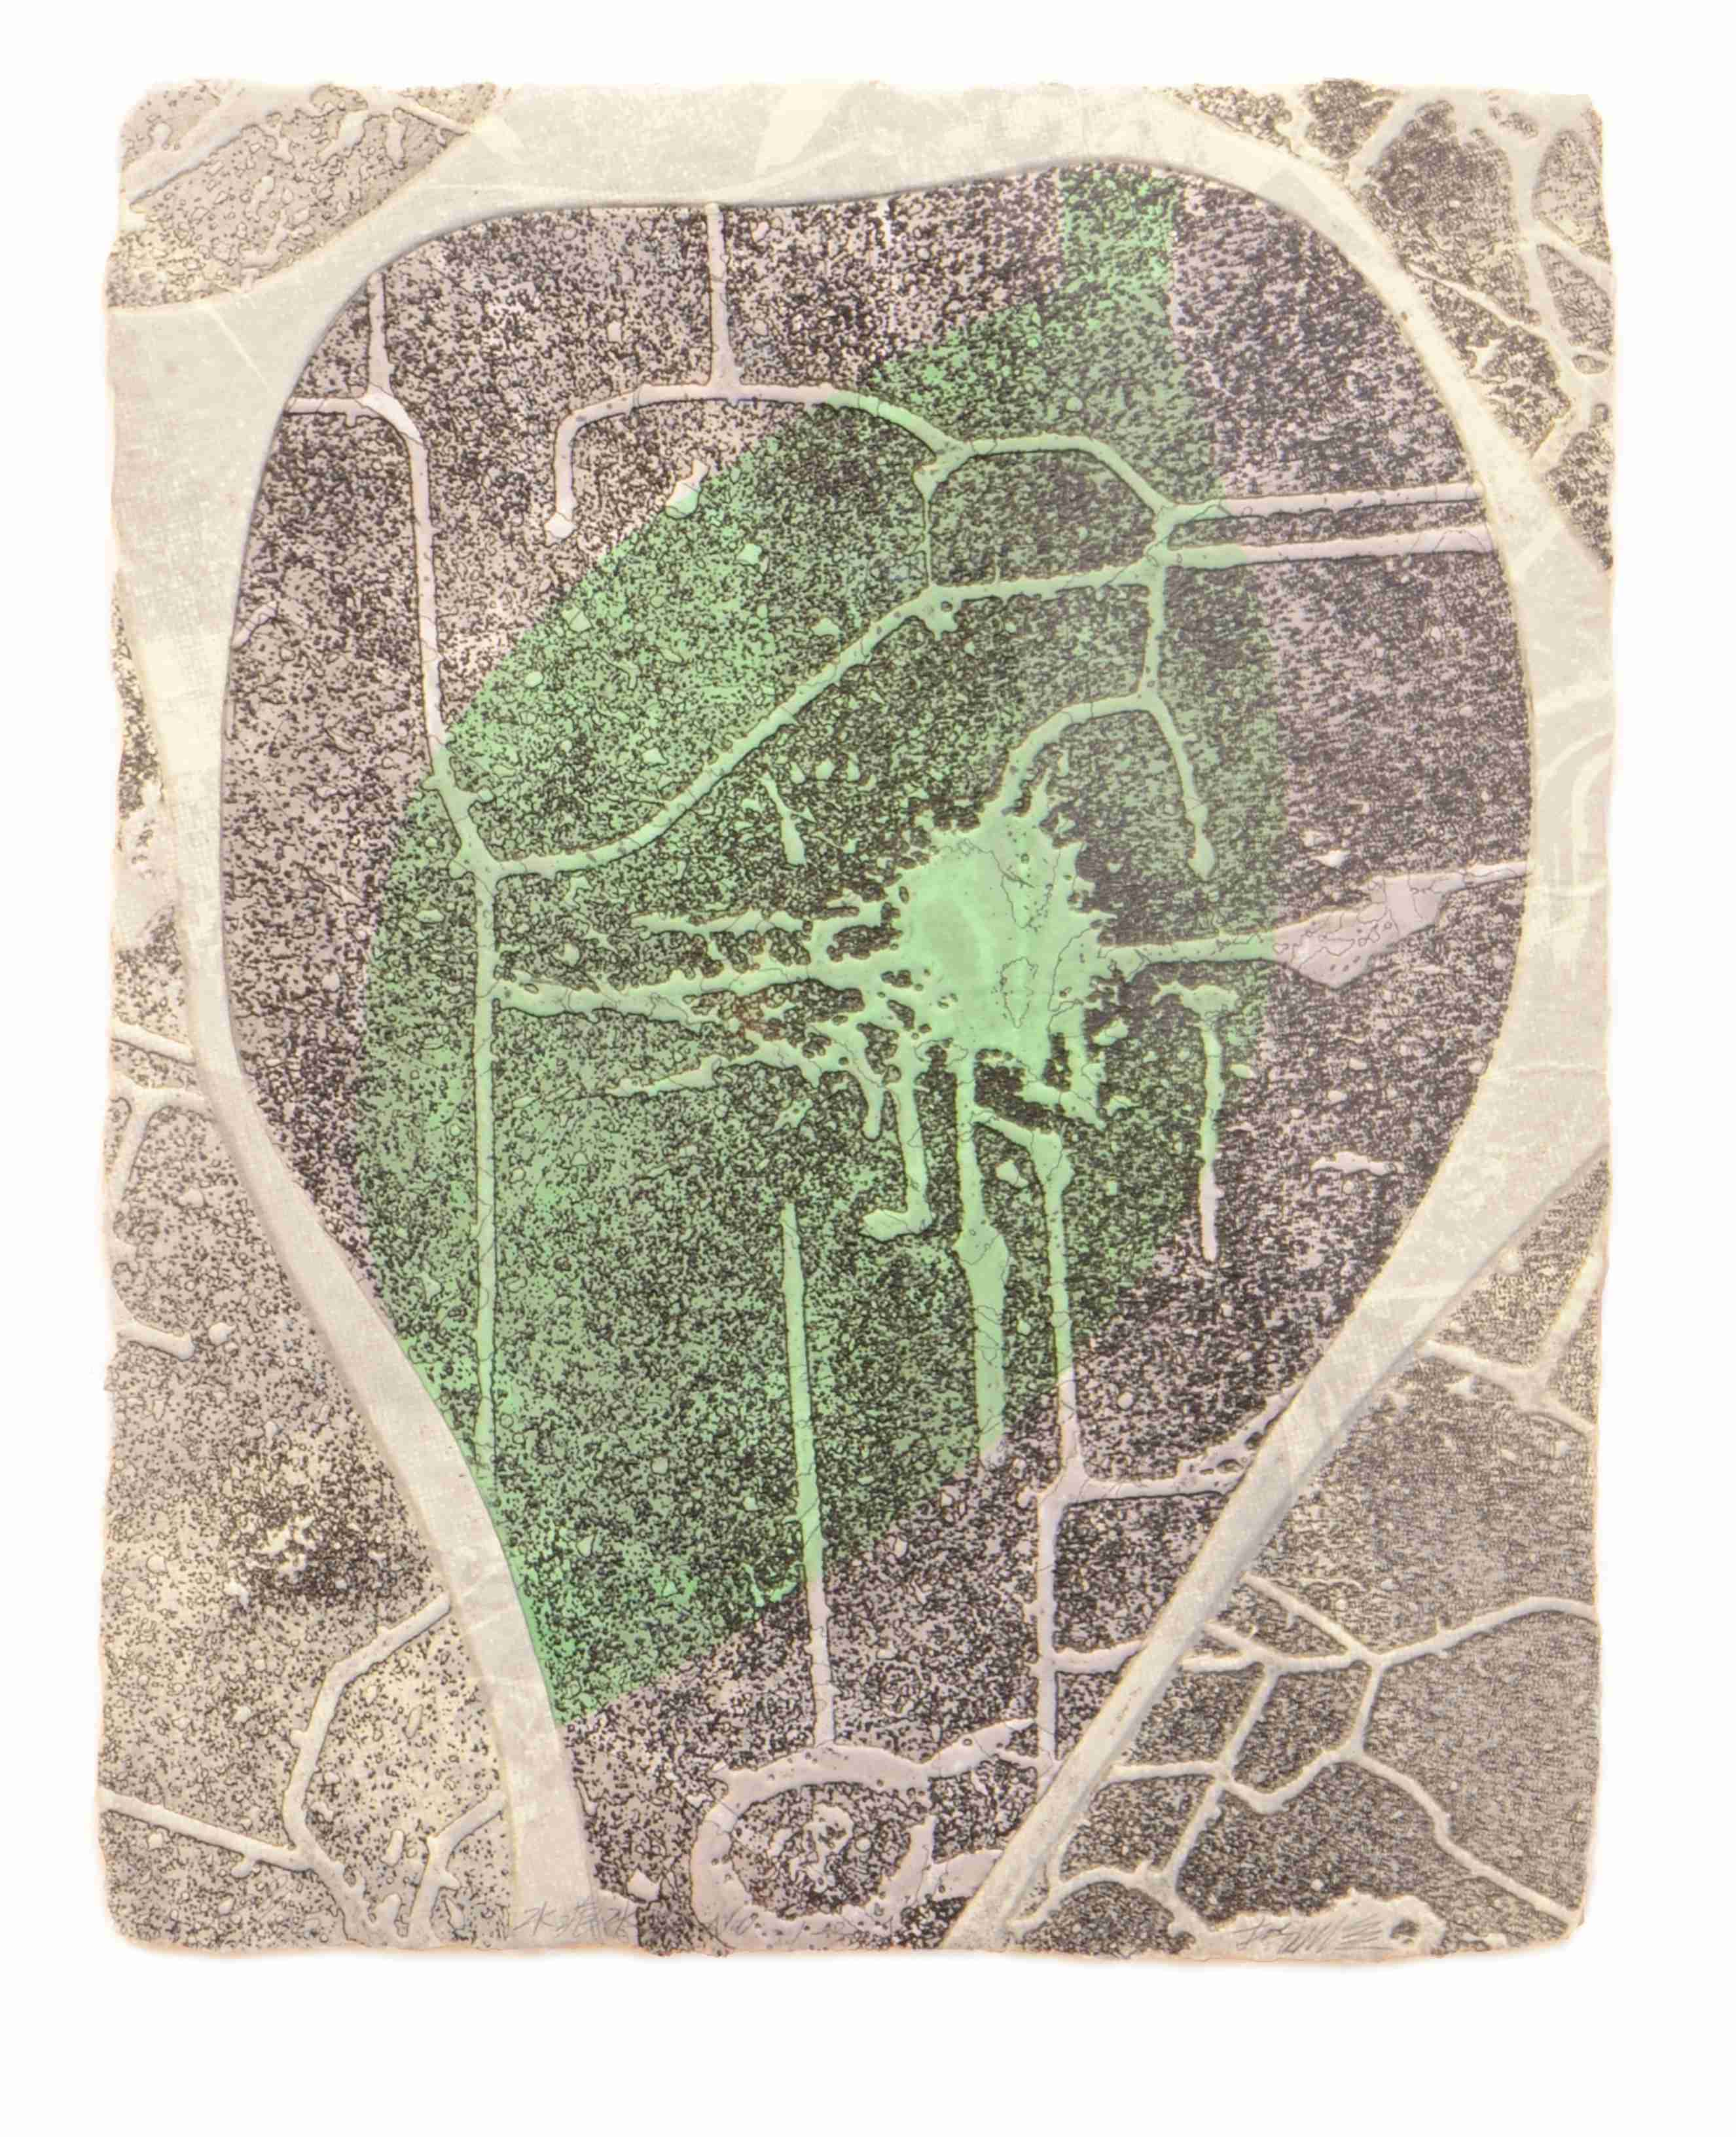 《水痕水衣No.1-3》,絹版、凹版,33×26cm,2011